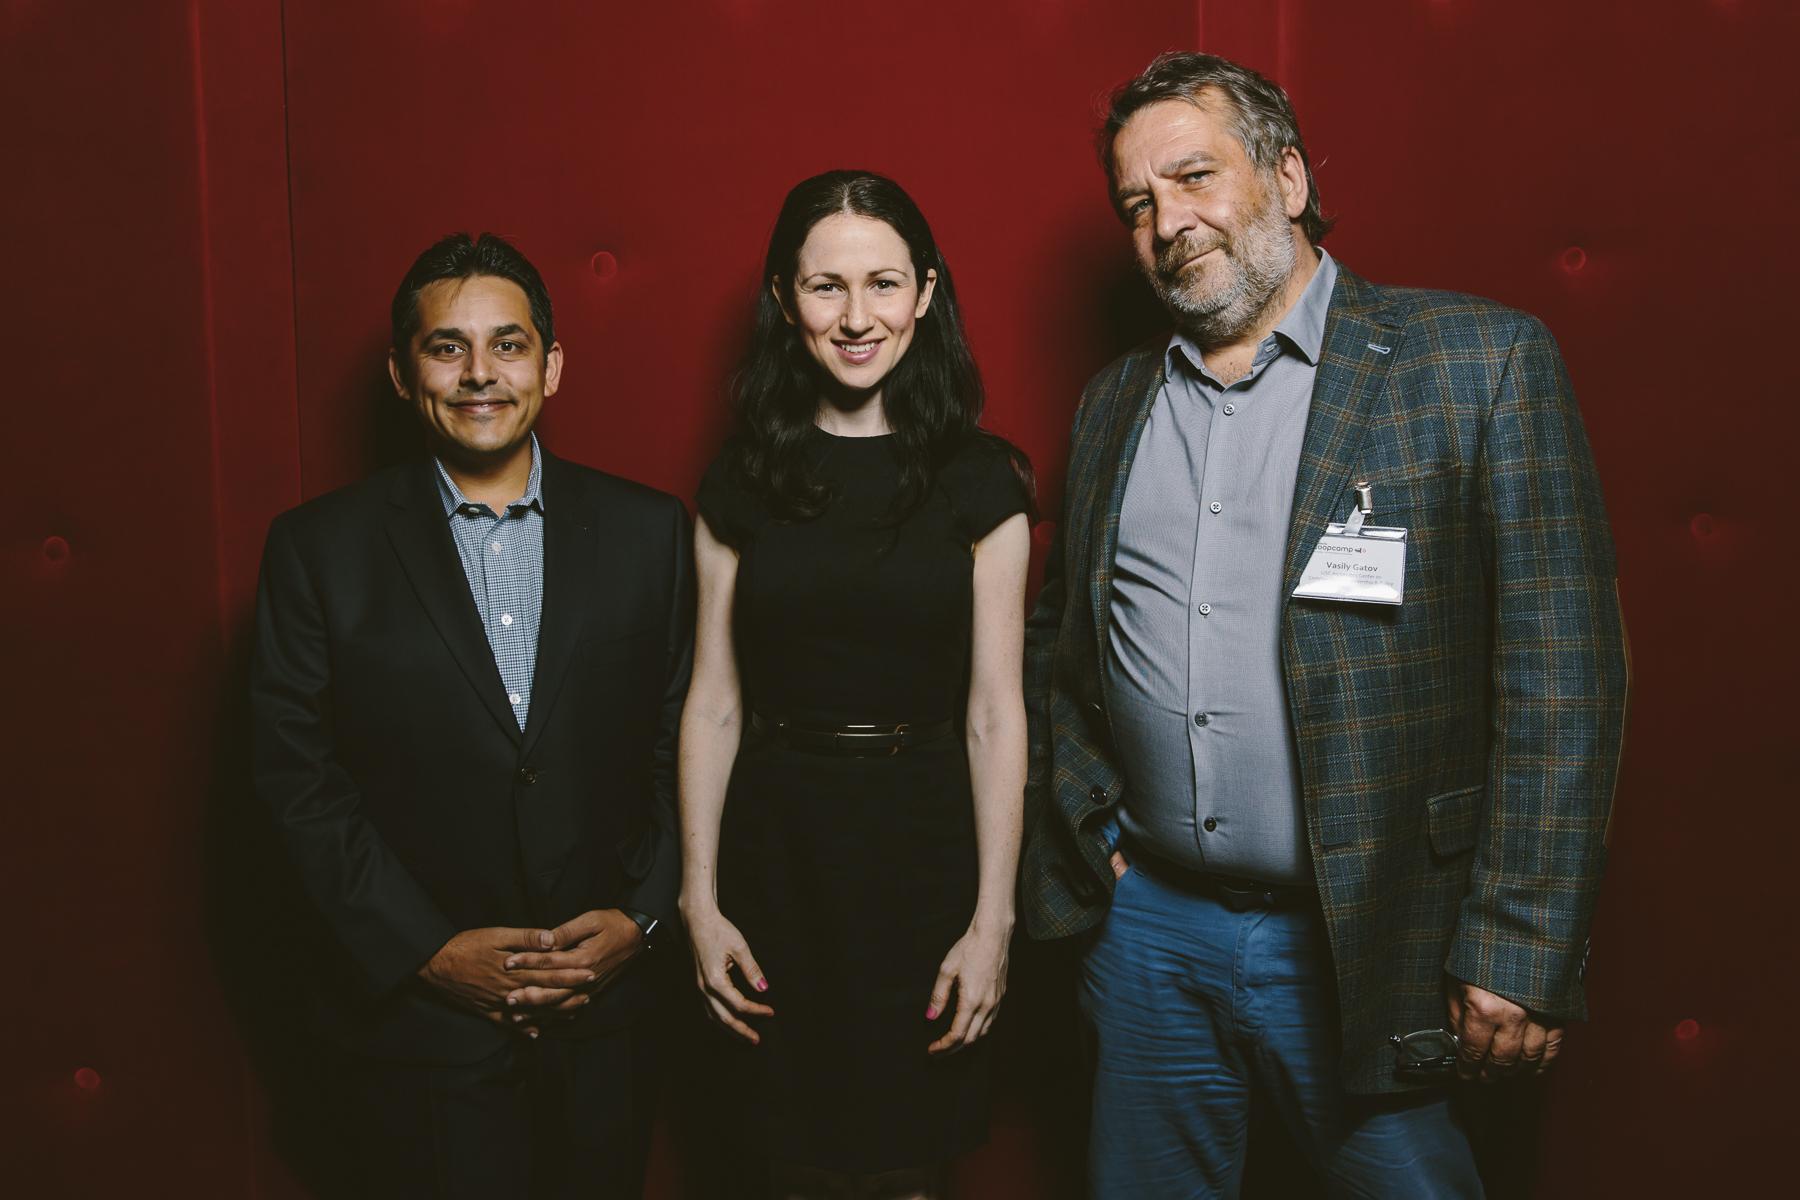 Die Keynoter Jigar Mehta (Fusion Media), Orit Kopel (WikiTribune) & Vasily Gatov (USC)